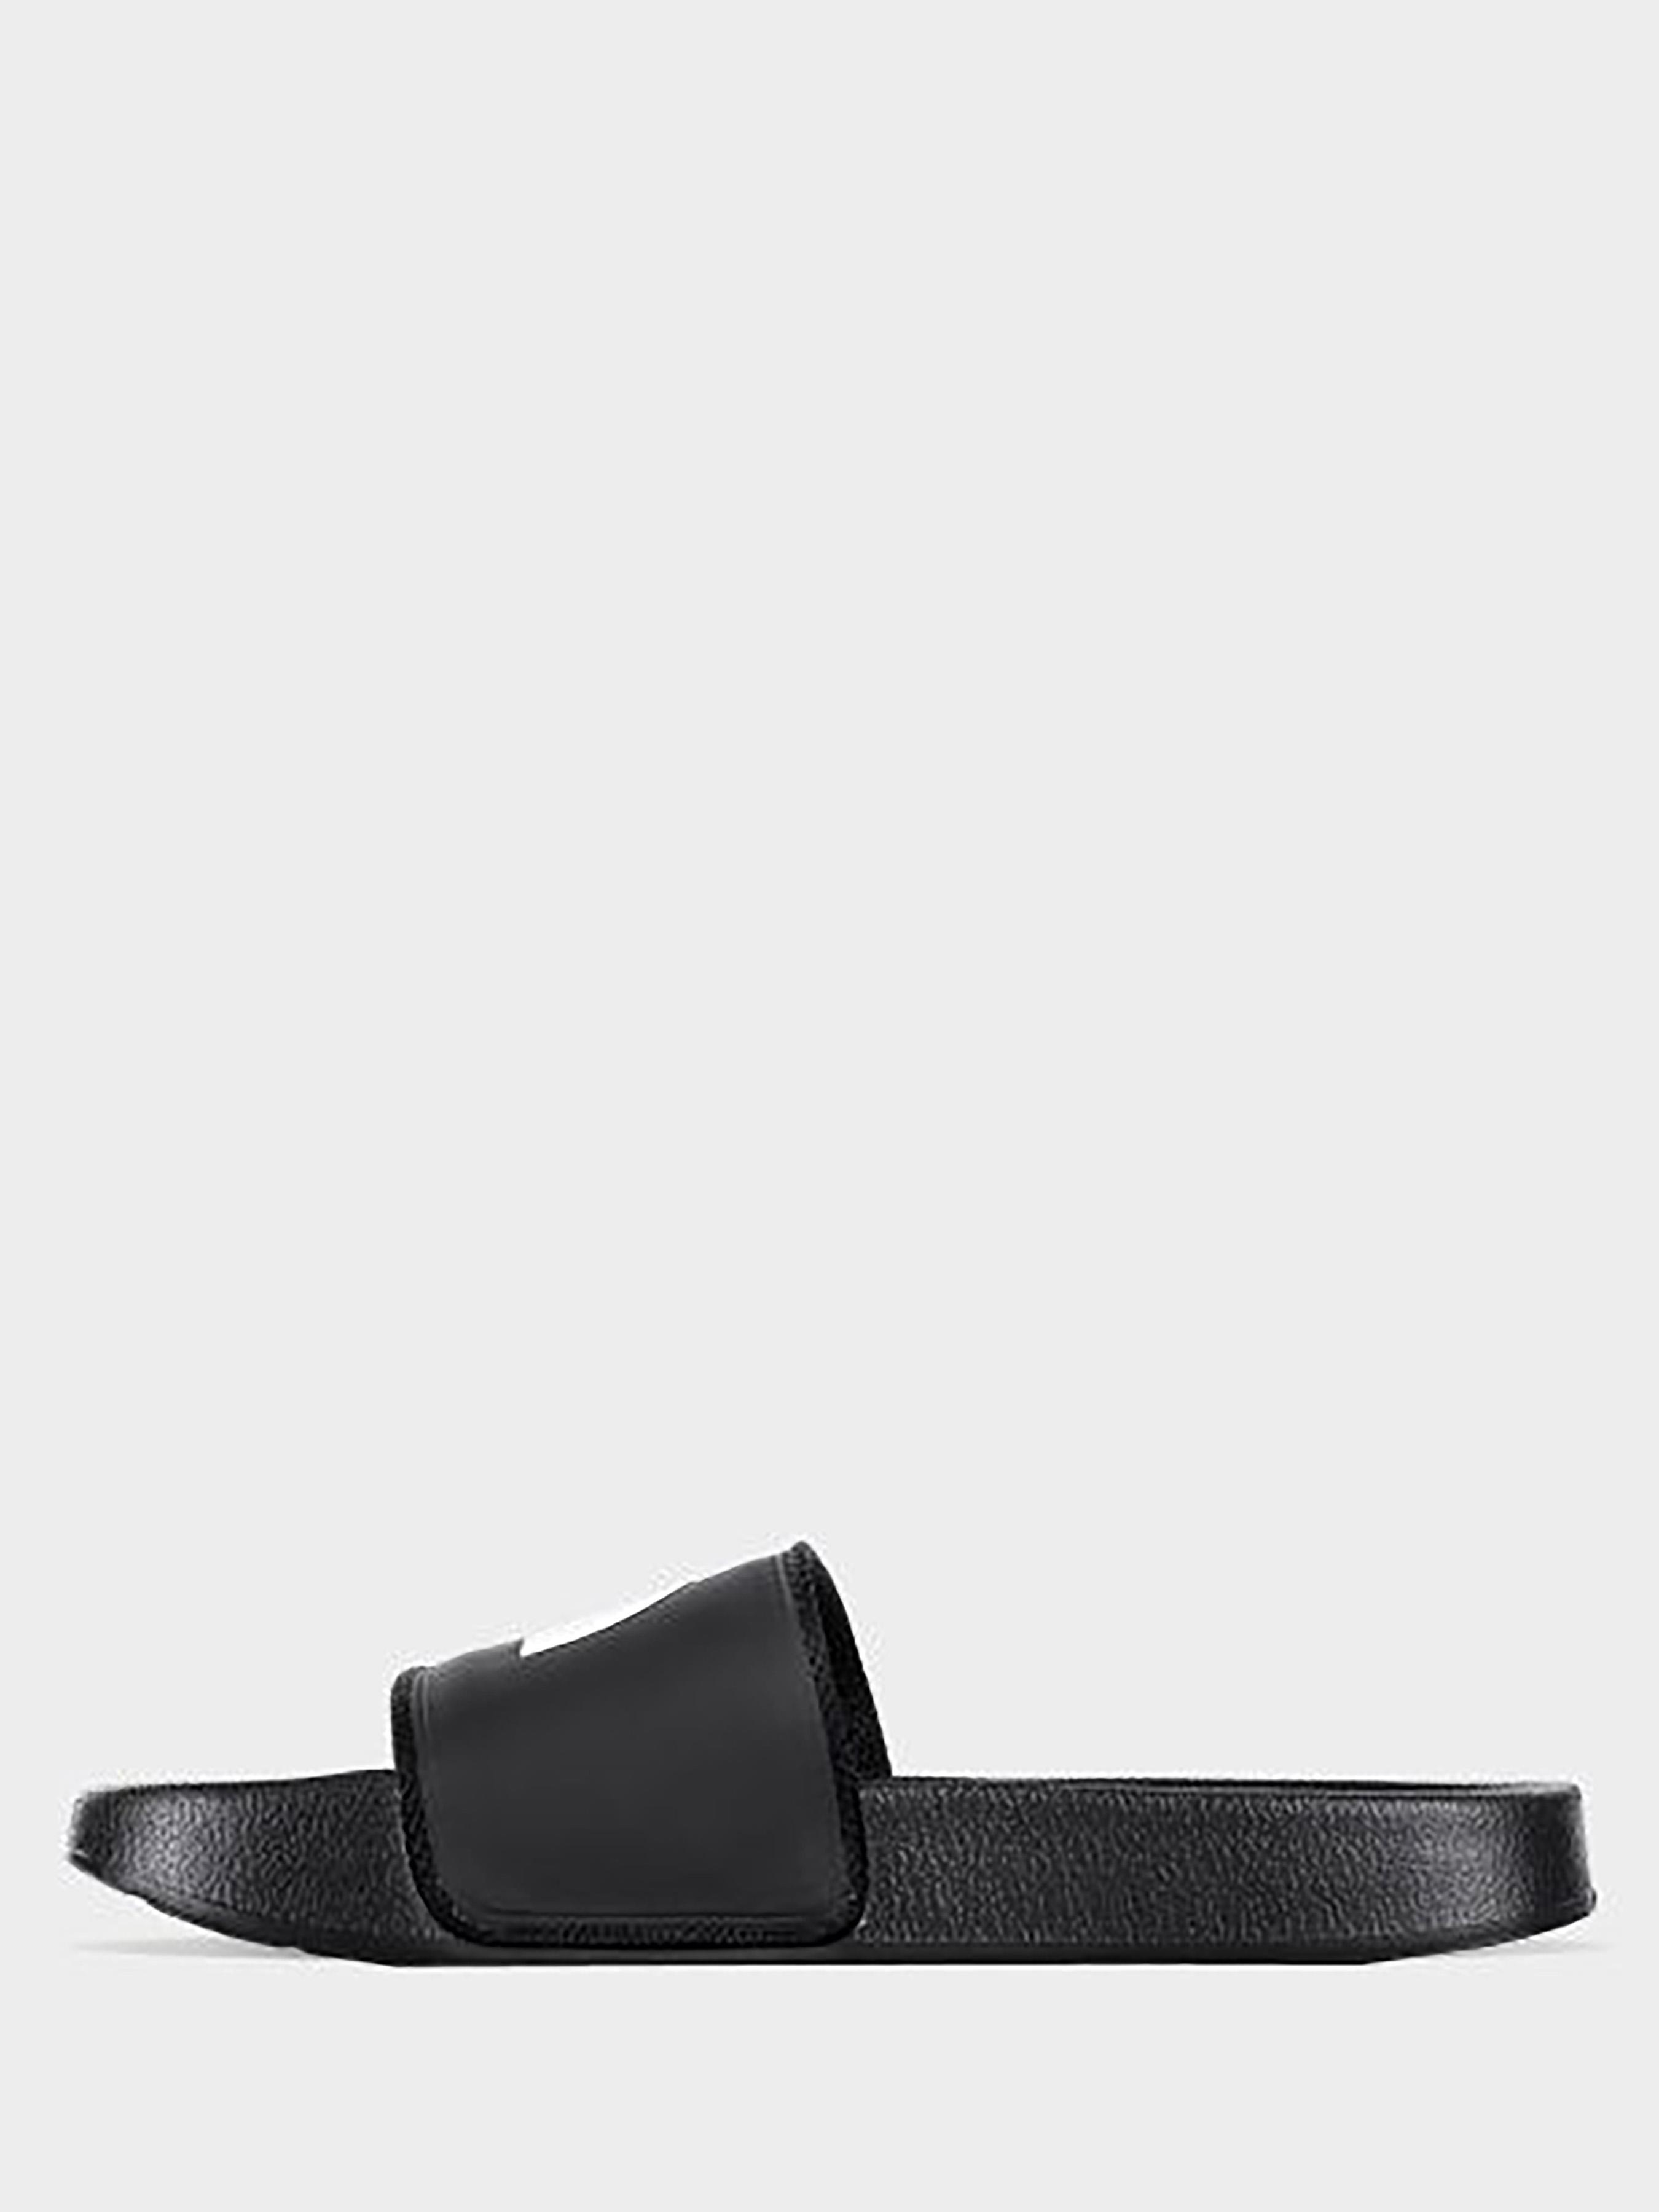 Шлёпанцы для женщин The North Face Base Camp Slide II NF0A3K4BKY41 обувь бренда, 2017